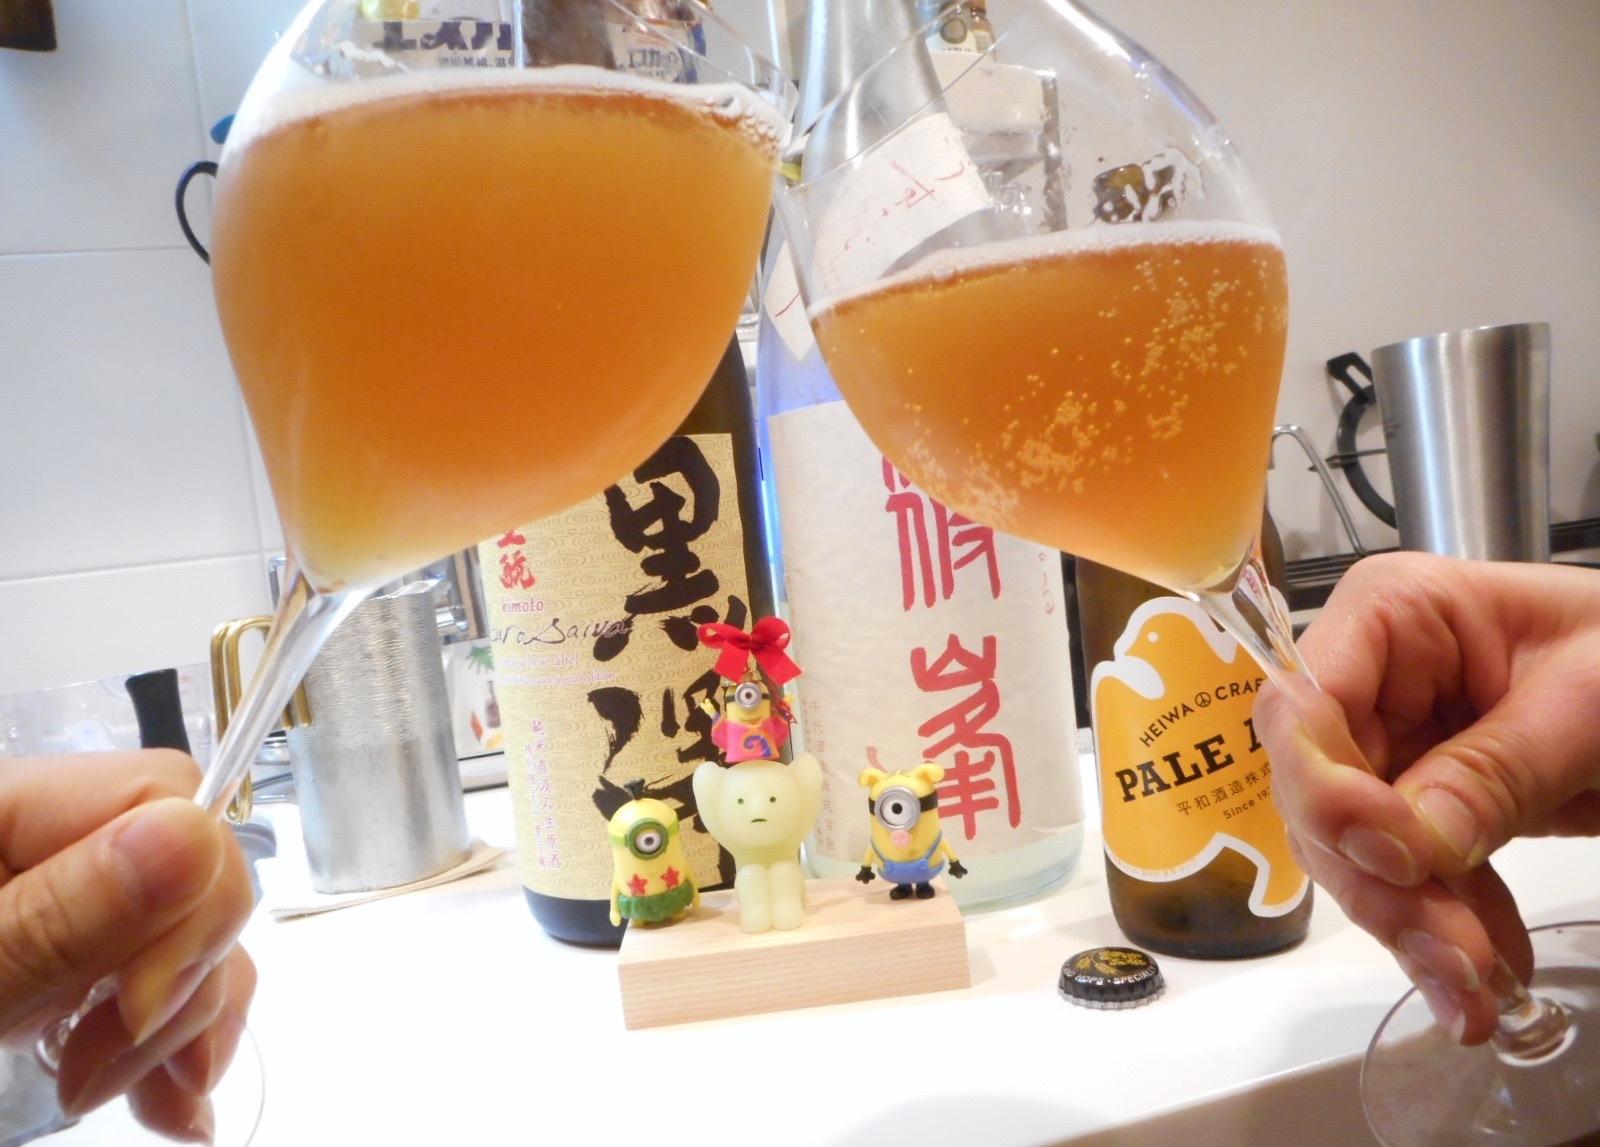 kurosawa_jikagumi_yellow28by18.jpg